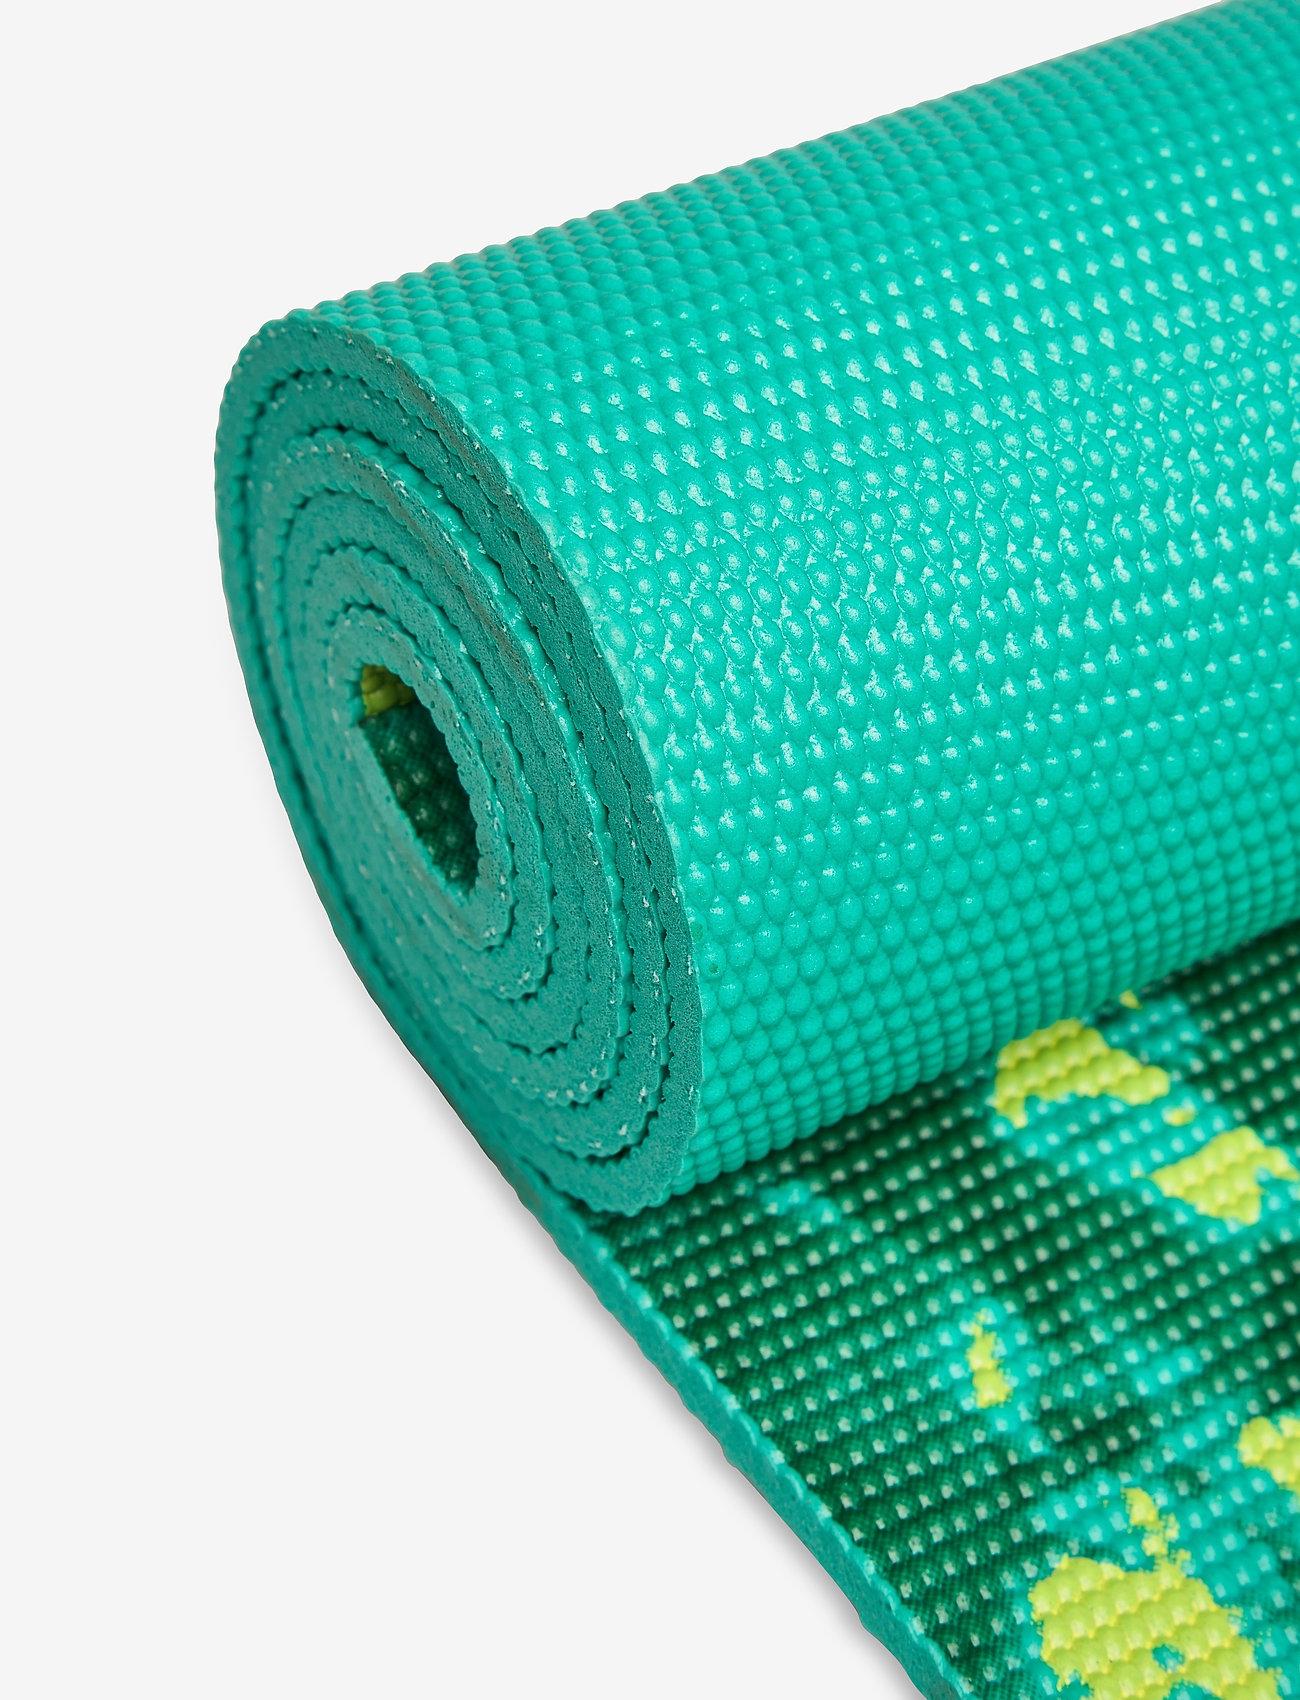 Gaiam - 6MM Yoga Mat Reversible - yogamatten & uitrusting - turquoise, green - 1